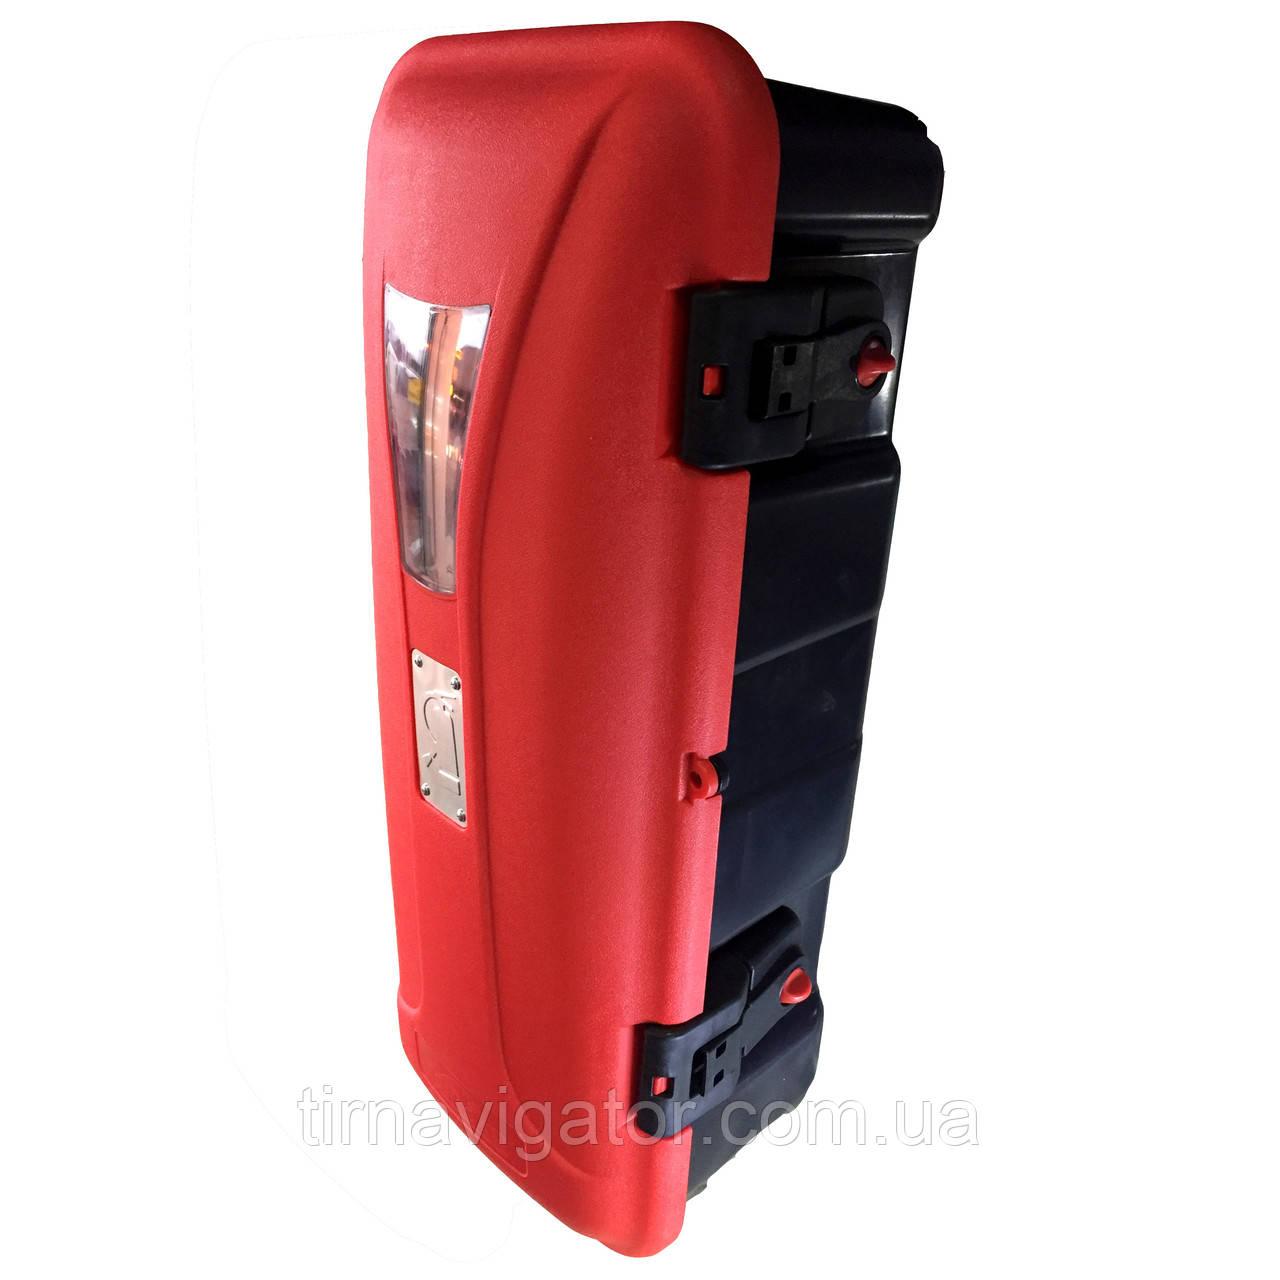 Ящик огнетушителя 6кг ISIKSAN (680х270х250, красно-чорный)